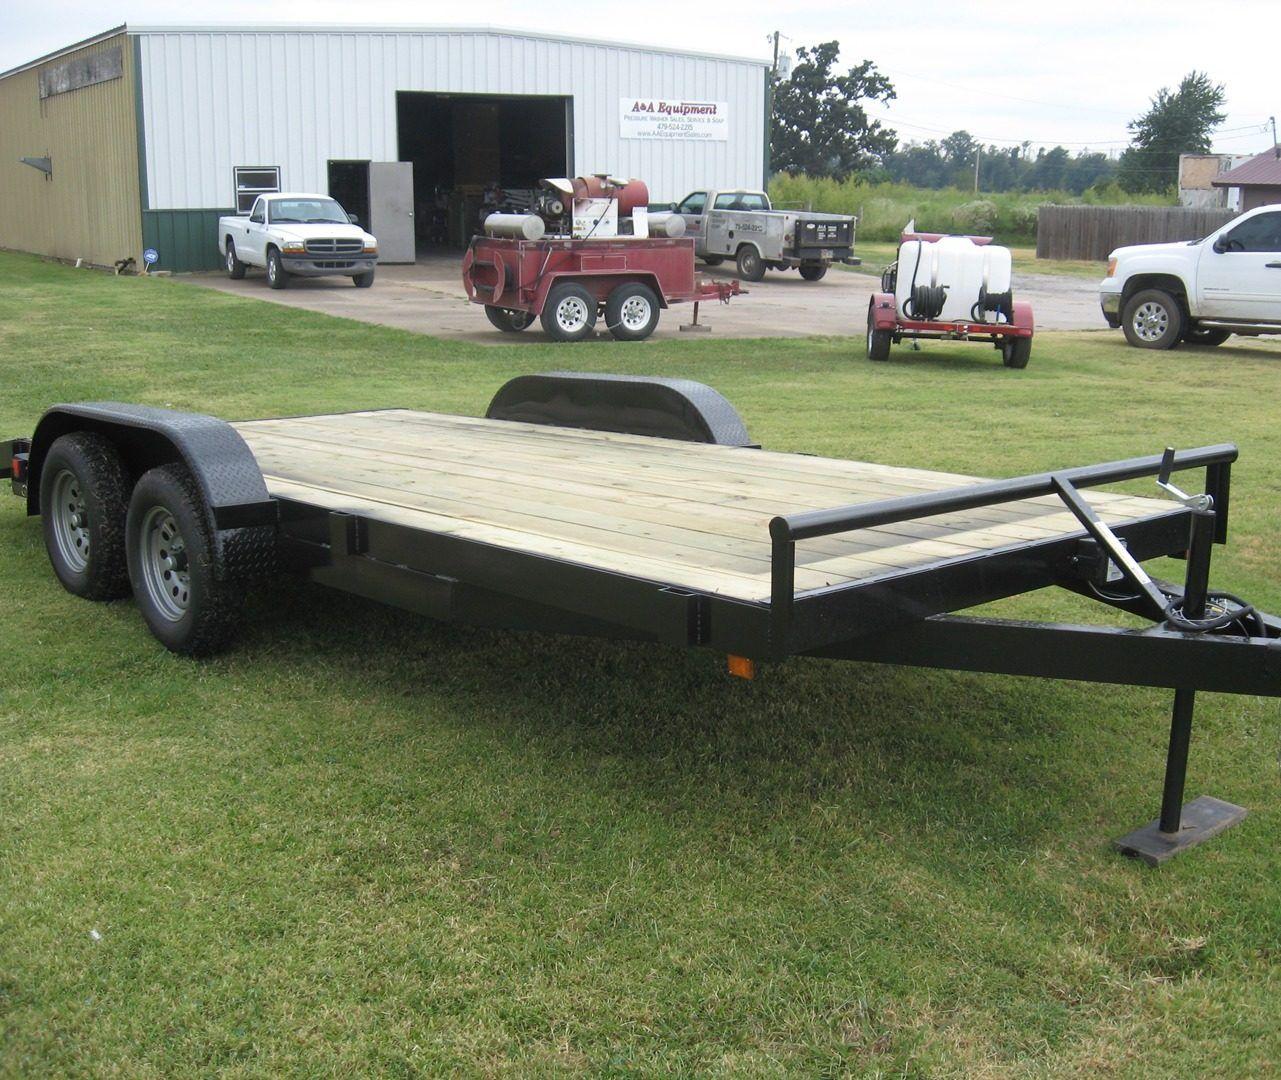 A&A Equipment trailer